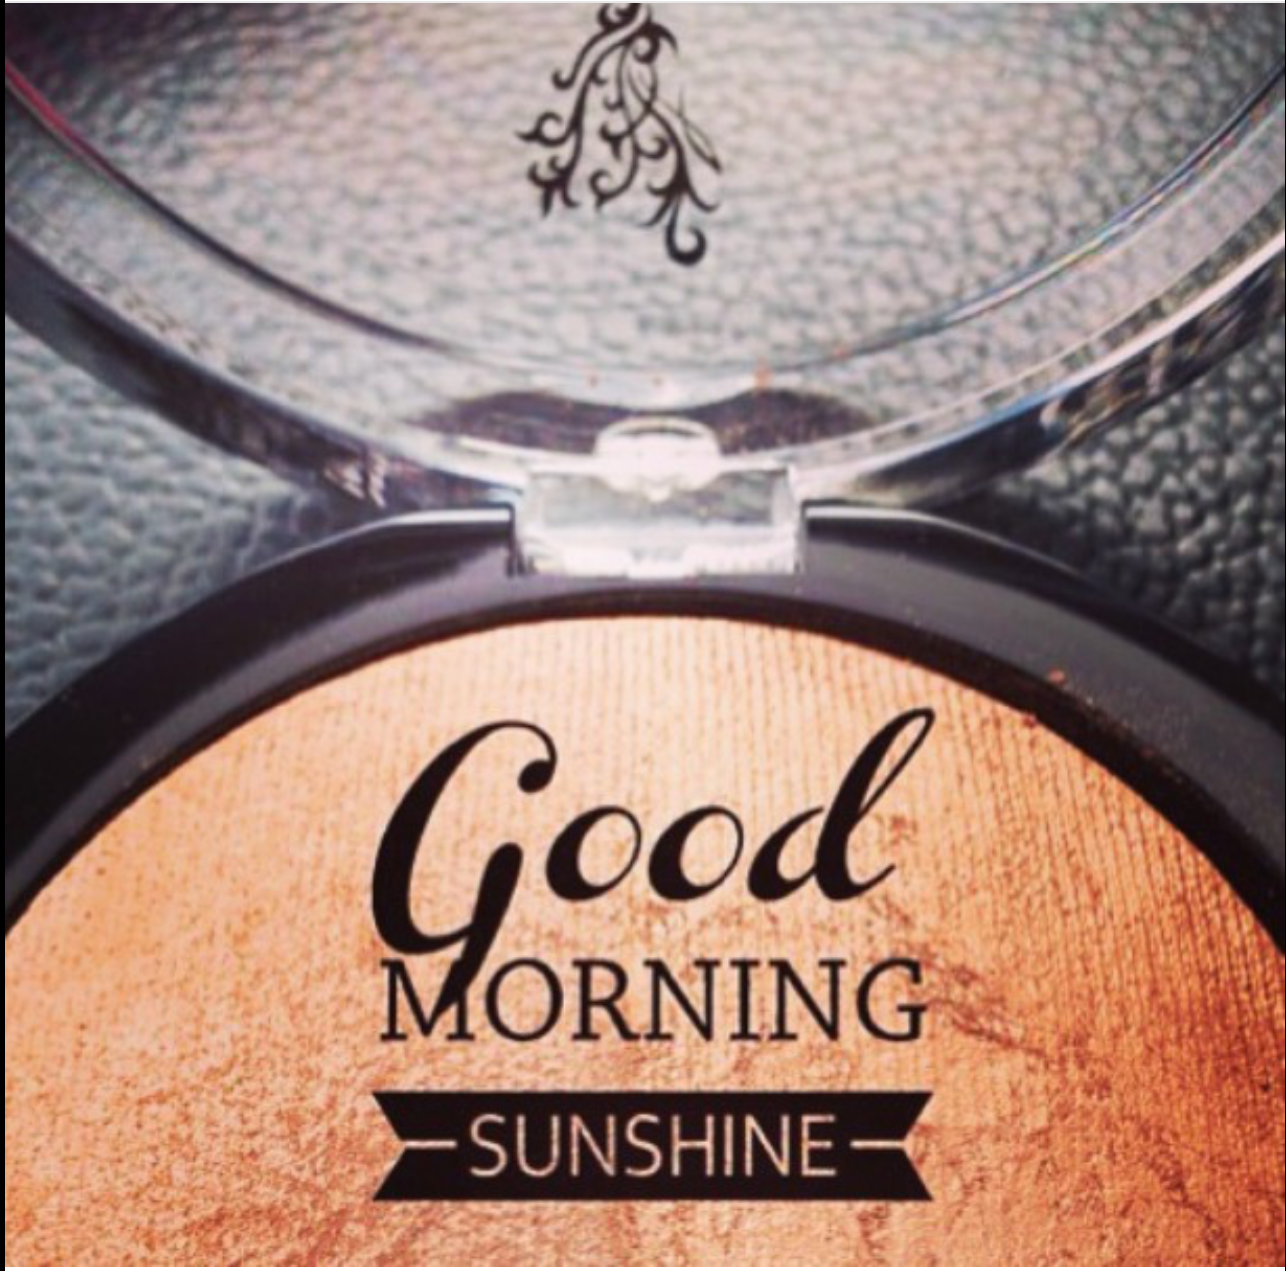 Good Morning Sunshine! beyouniquewithjenna